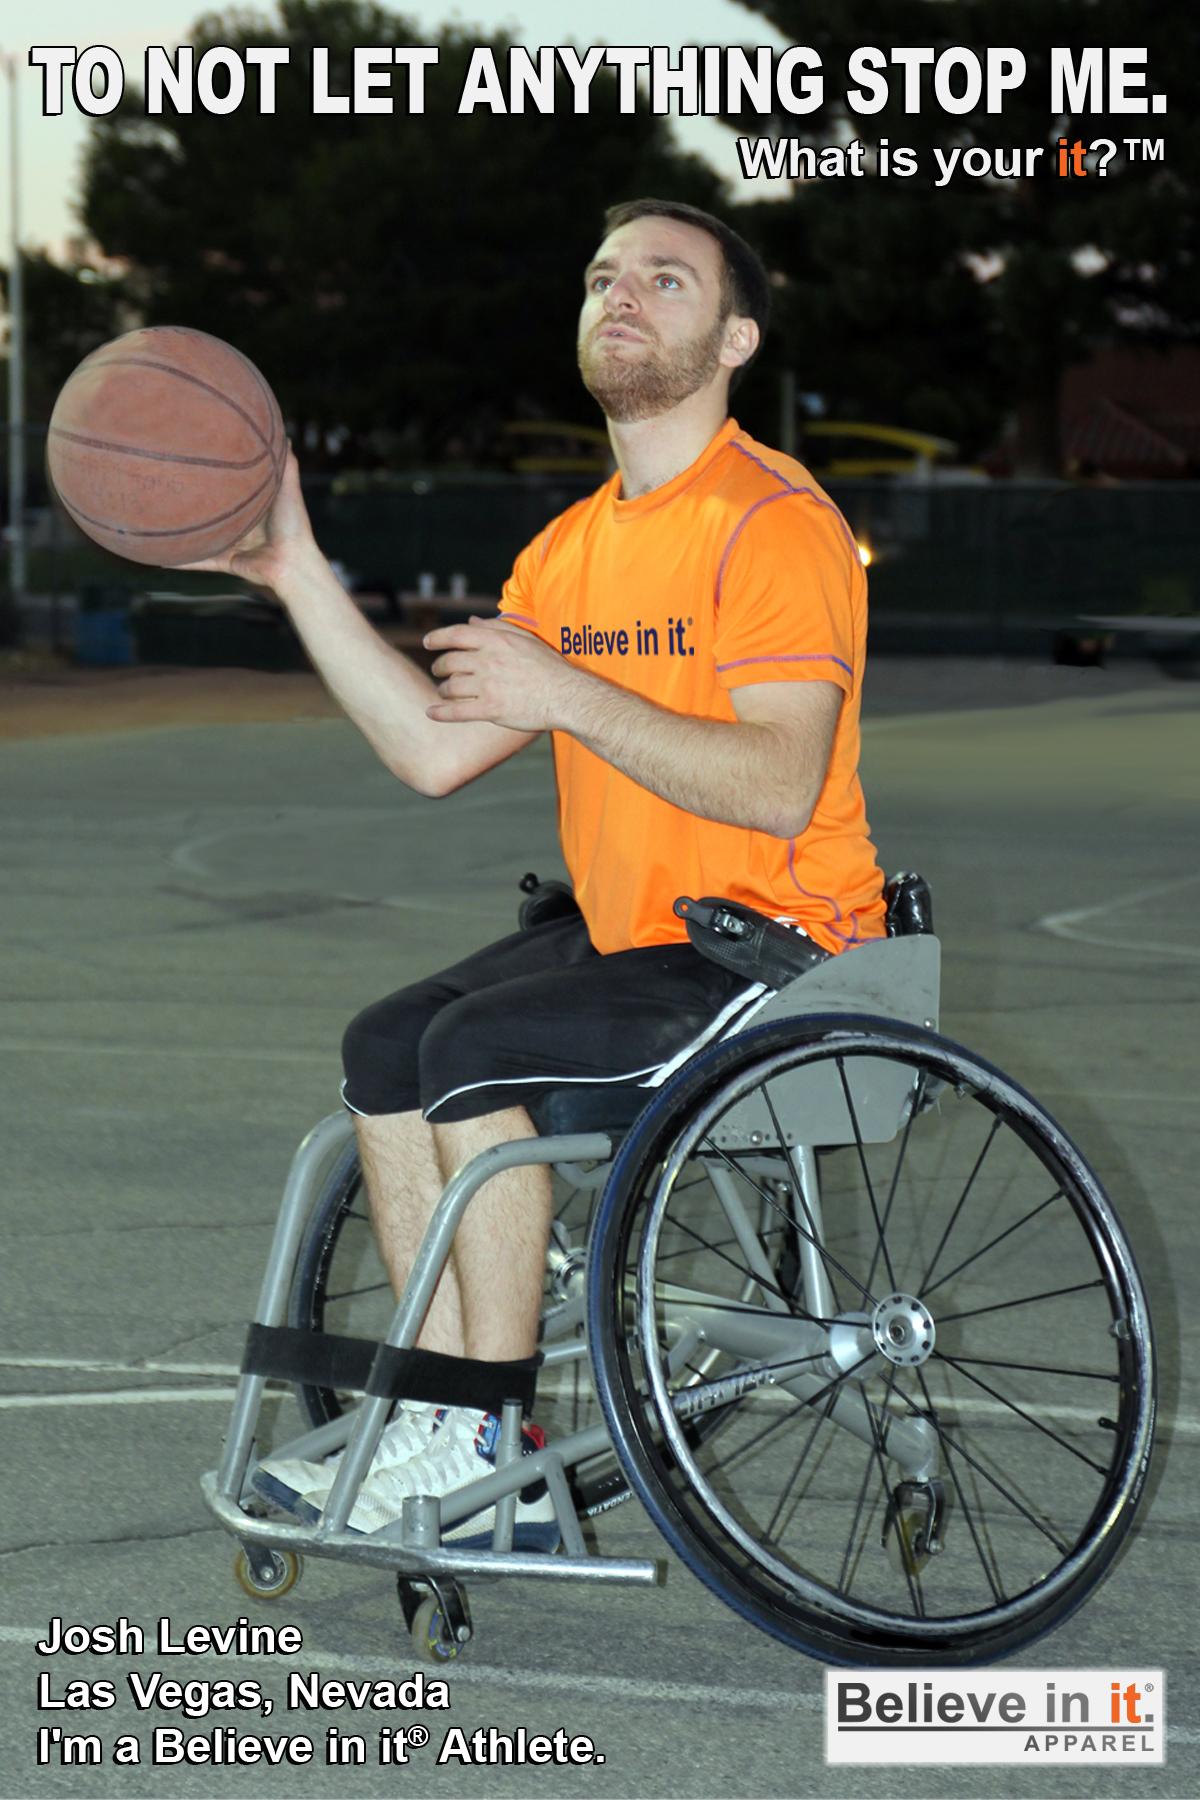 Josh levine Believe in it Athlete